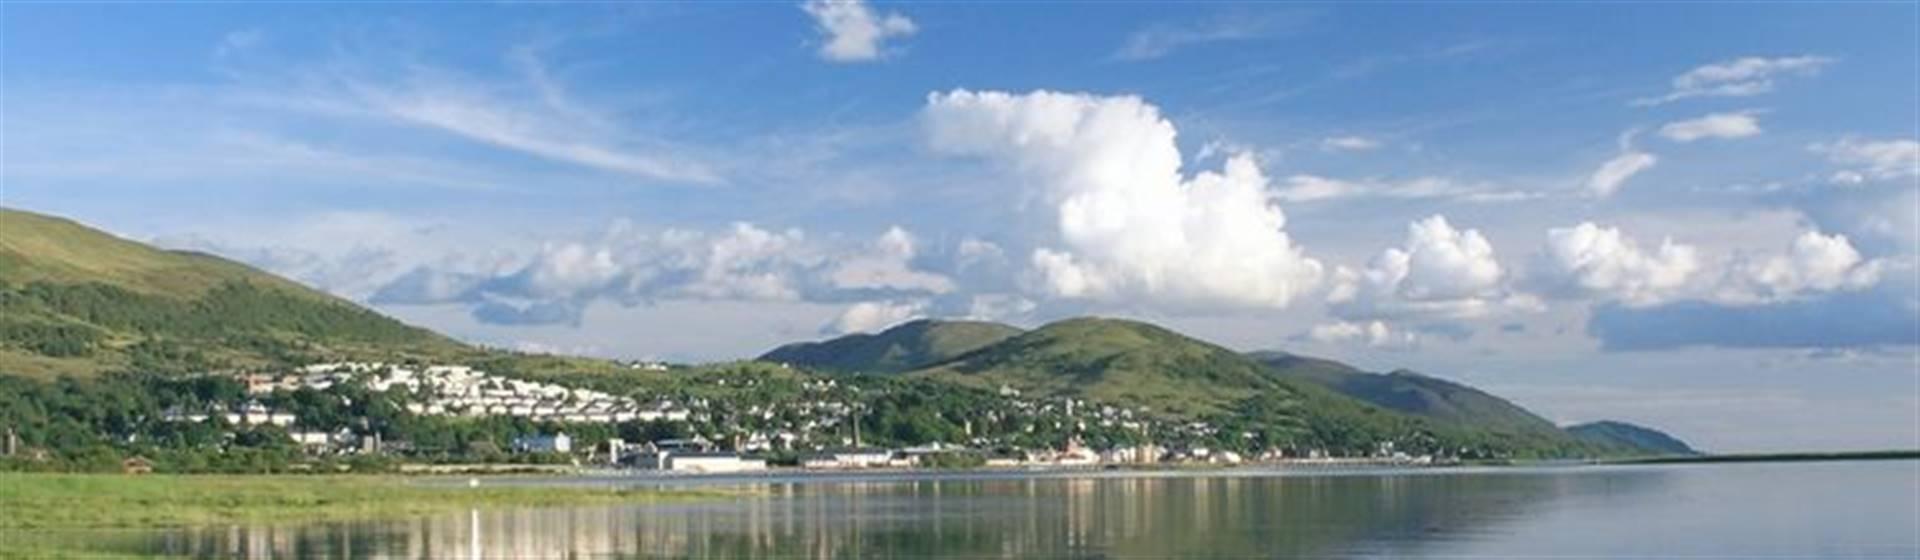 Fortwilliam & The Great Glen